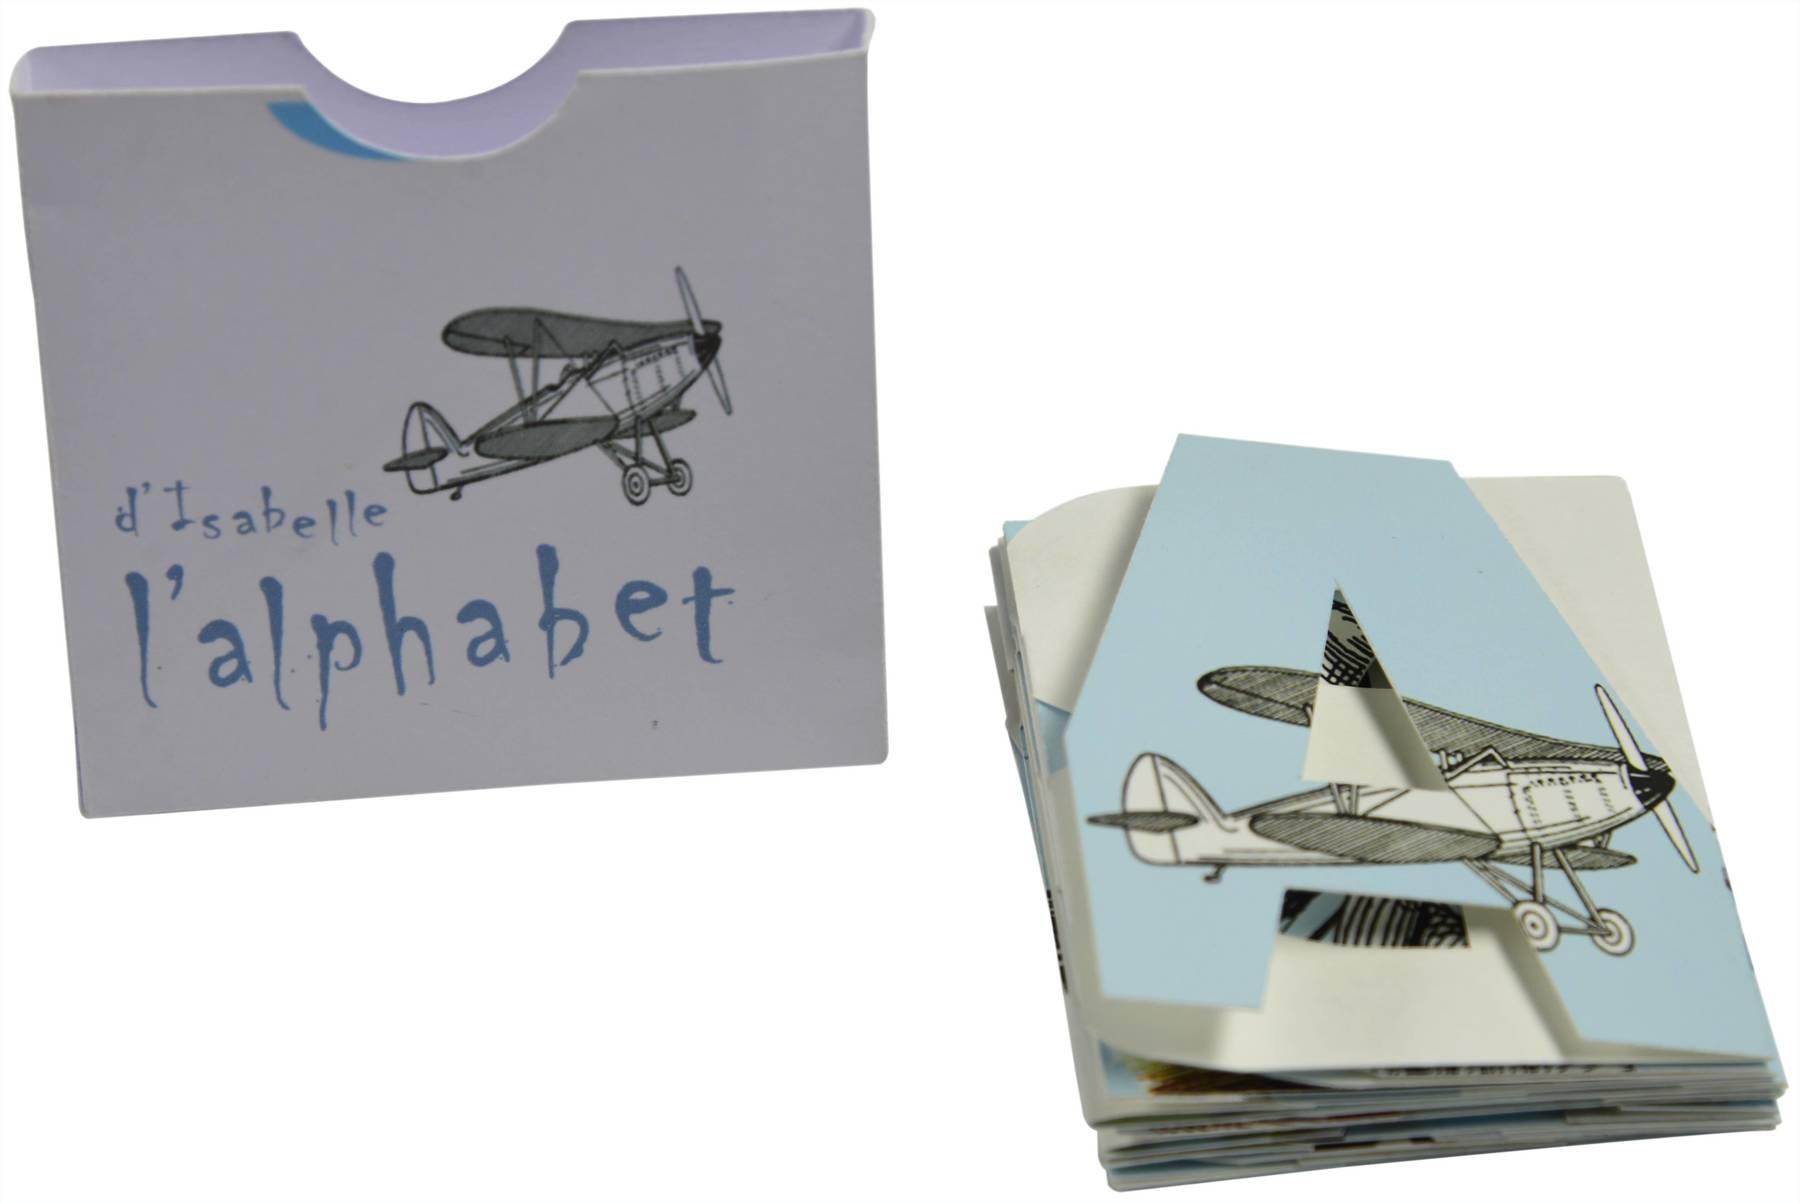 Contenu du L'alphabet